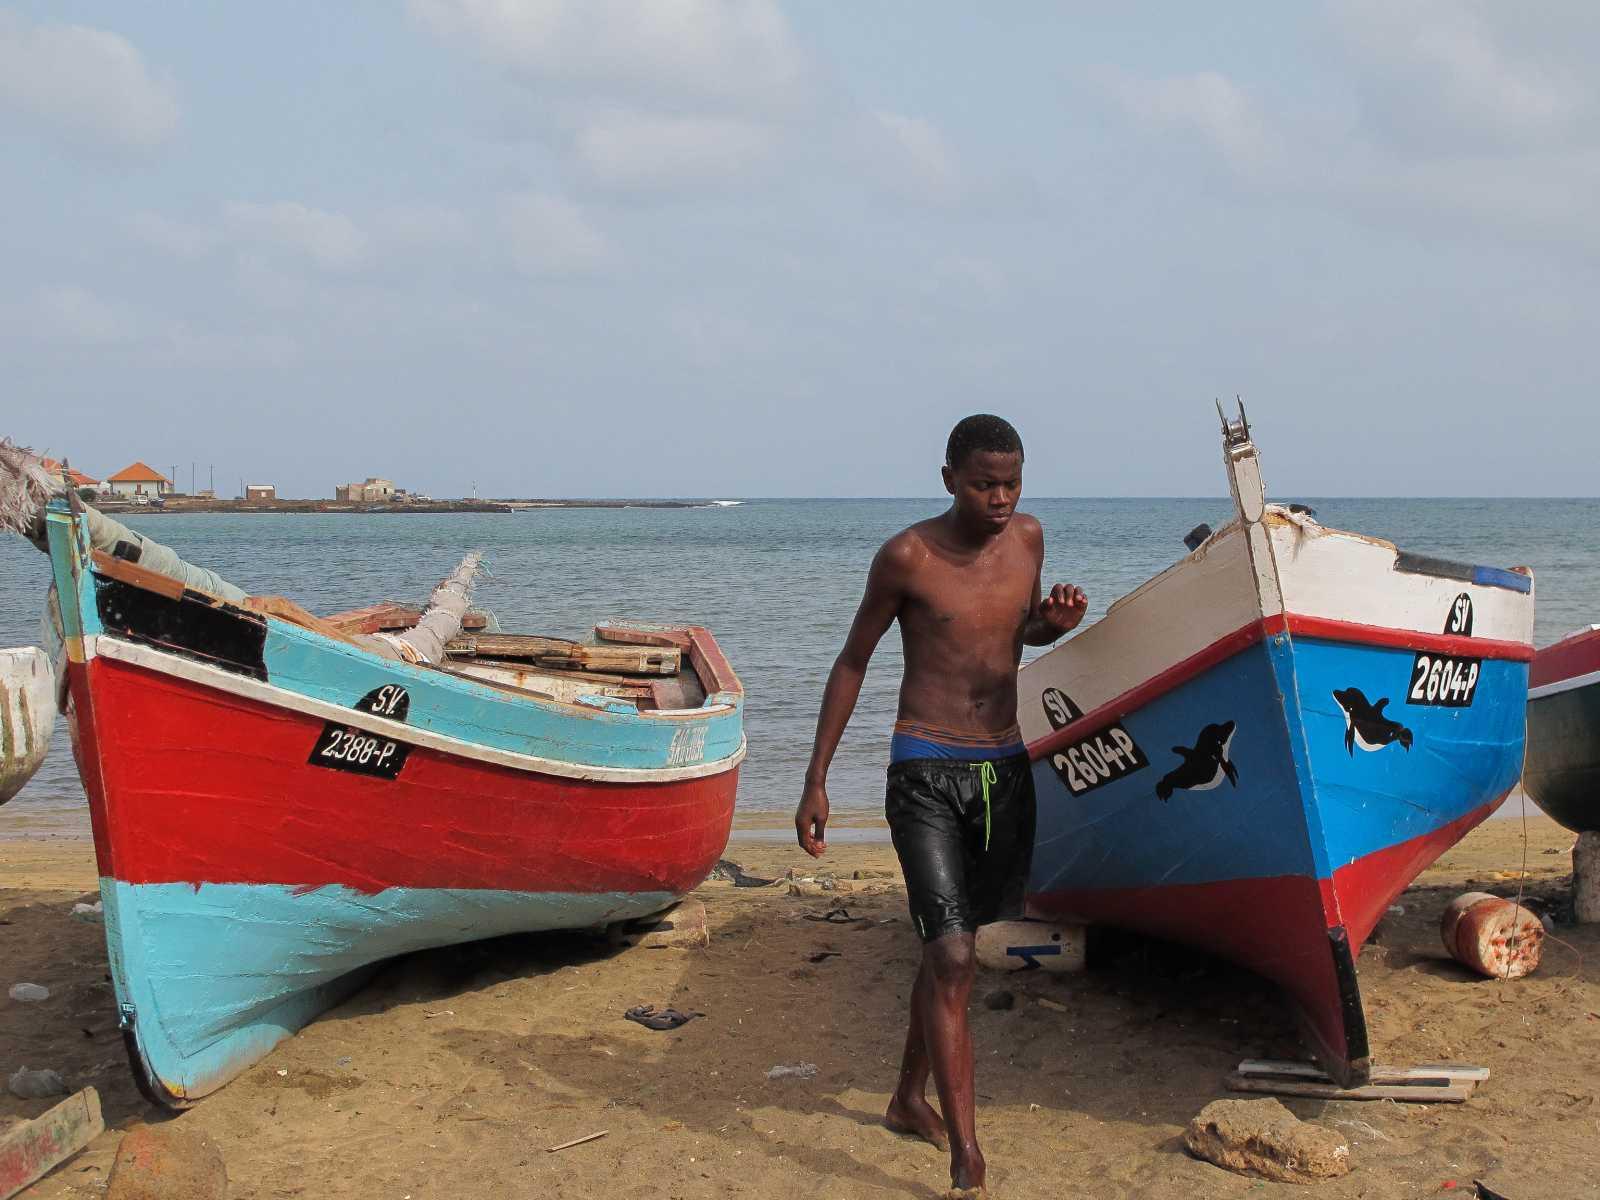 Cap-Vert - Baignade sur la plage de Baia das Gatas, à Sao Vicente